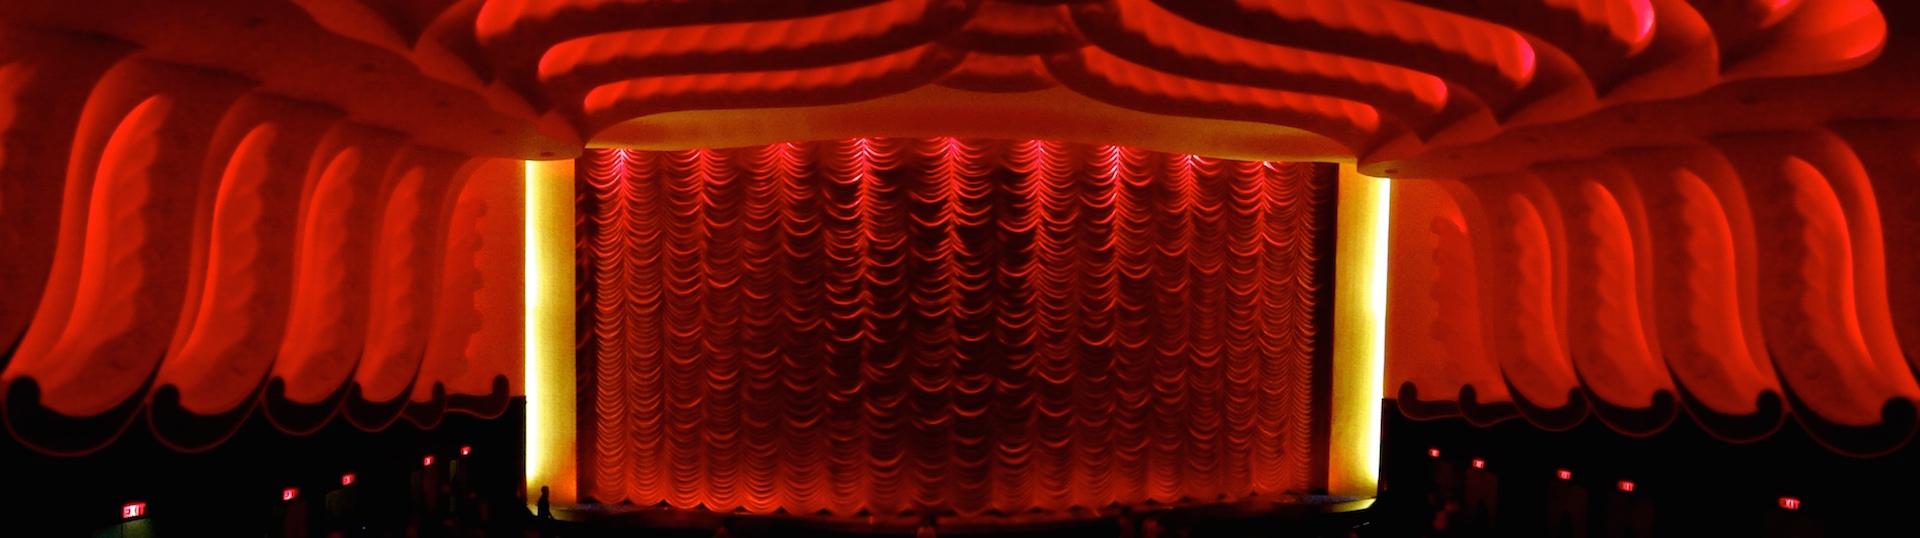 Raj Mandir Cinema, Jaipur, Rajasthan, Inde, Inde du Nord